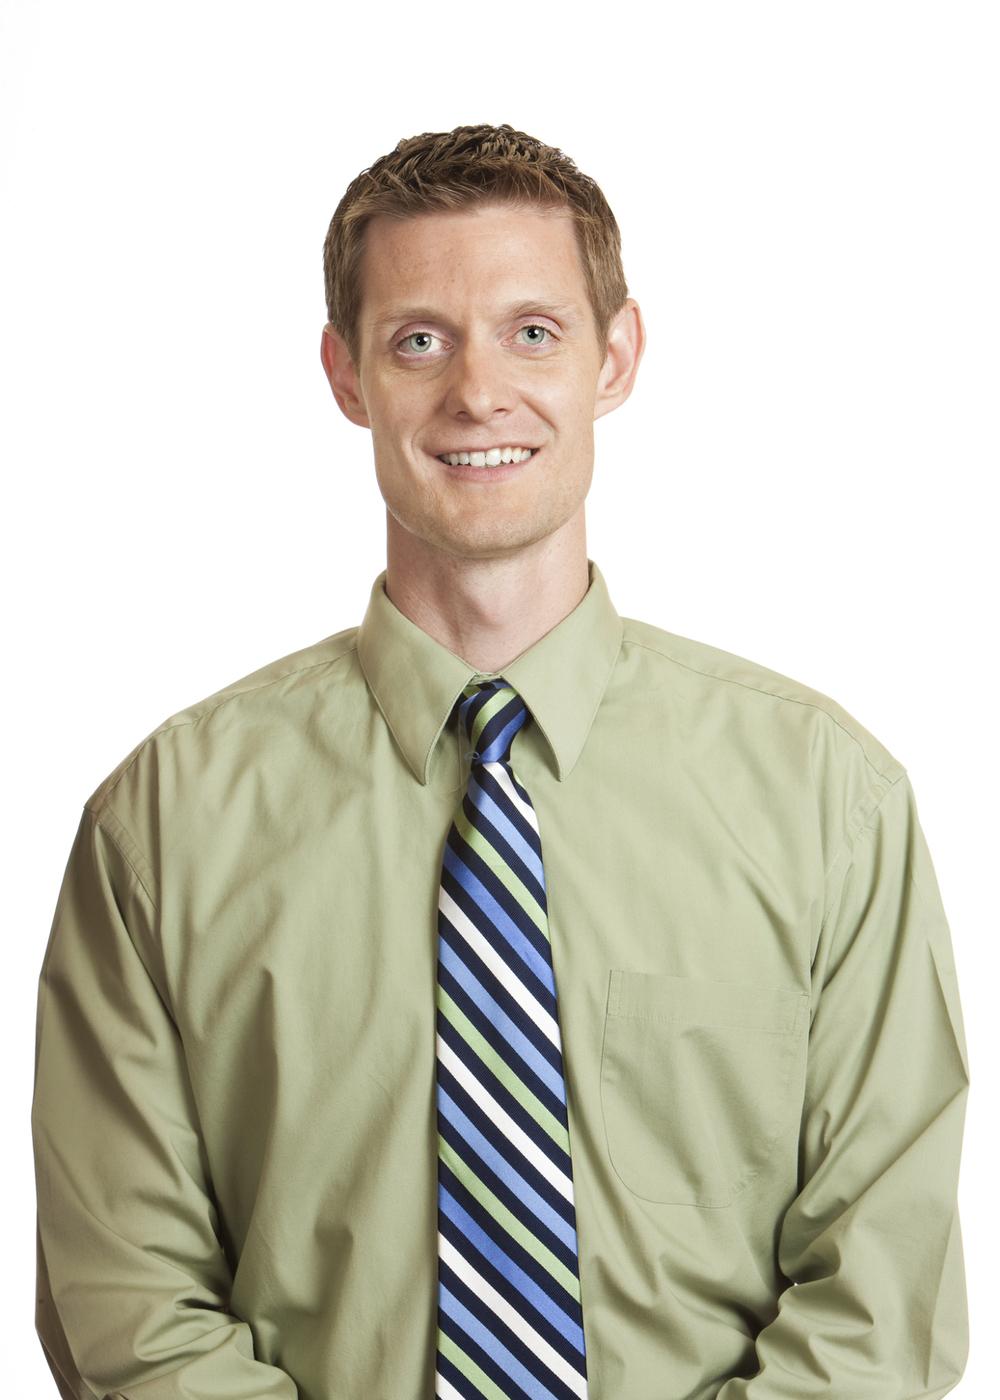 Nick Siddoway